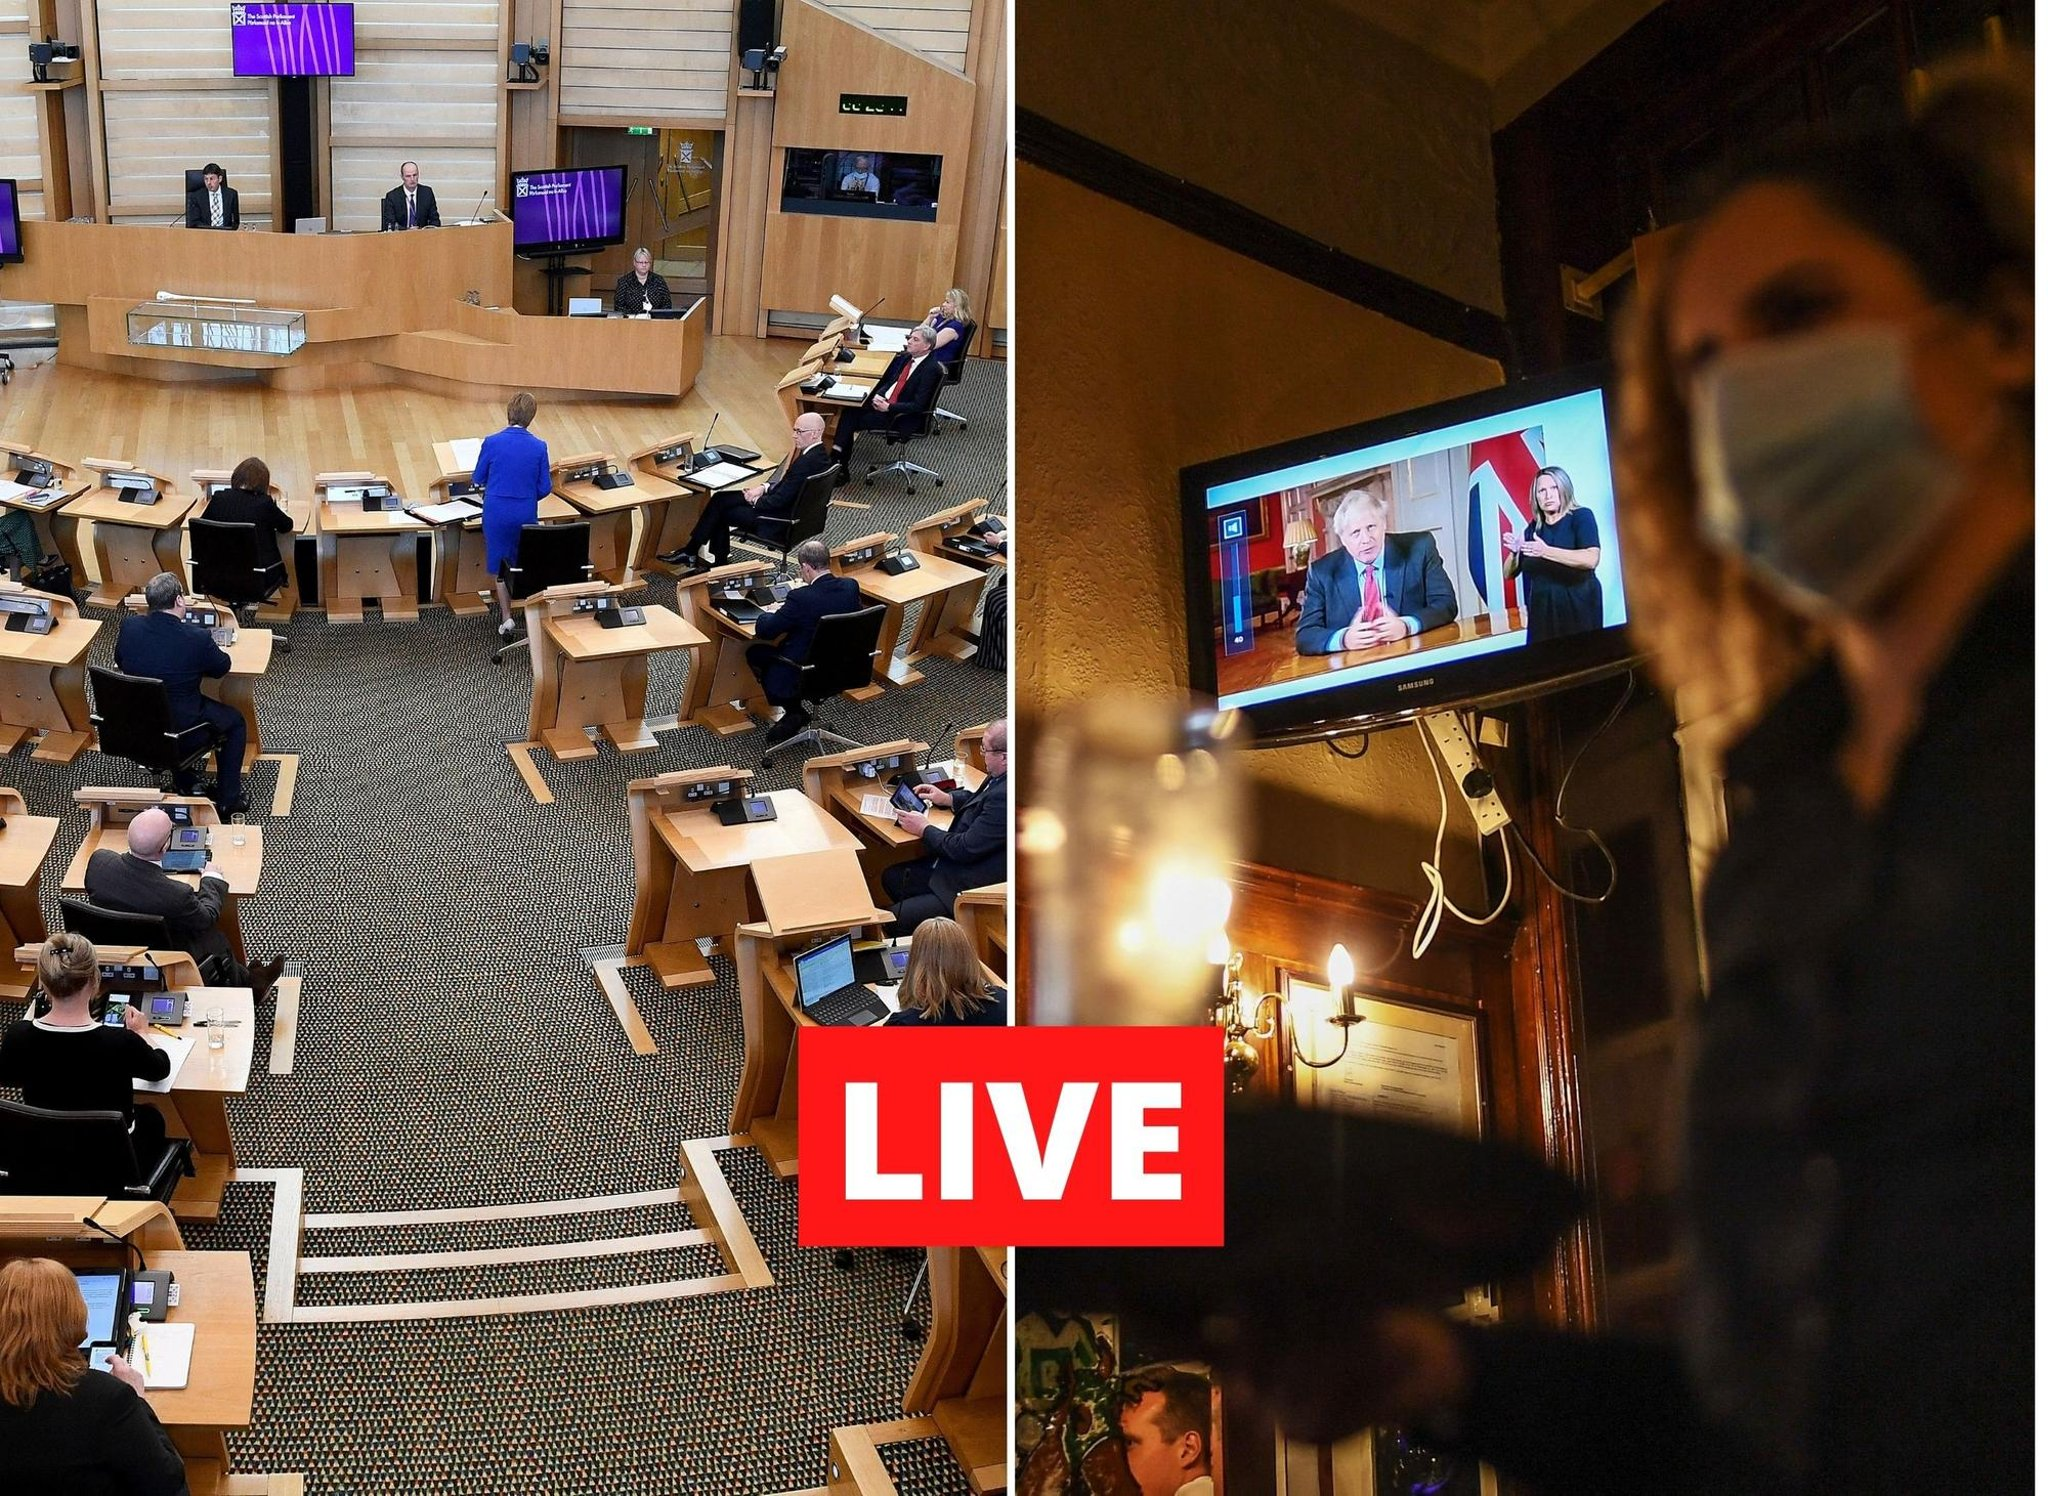 Nicola Sturgeon LIVE: Scottish Government coronavirus briefing led by First Minister